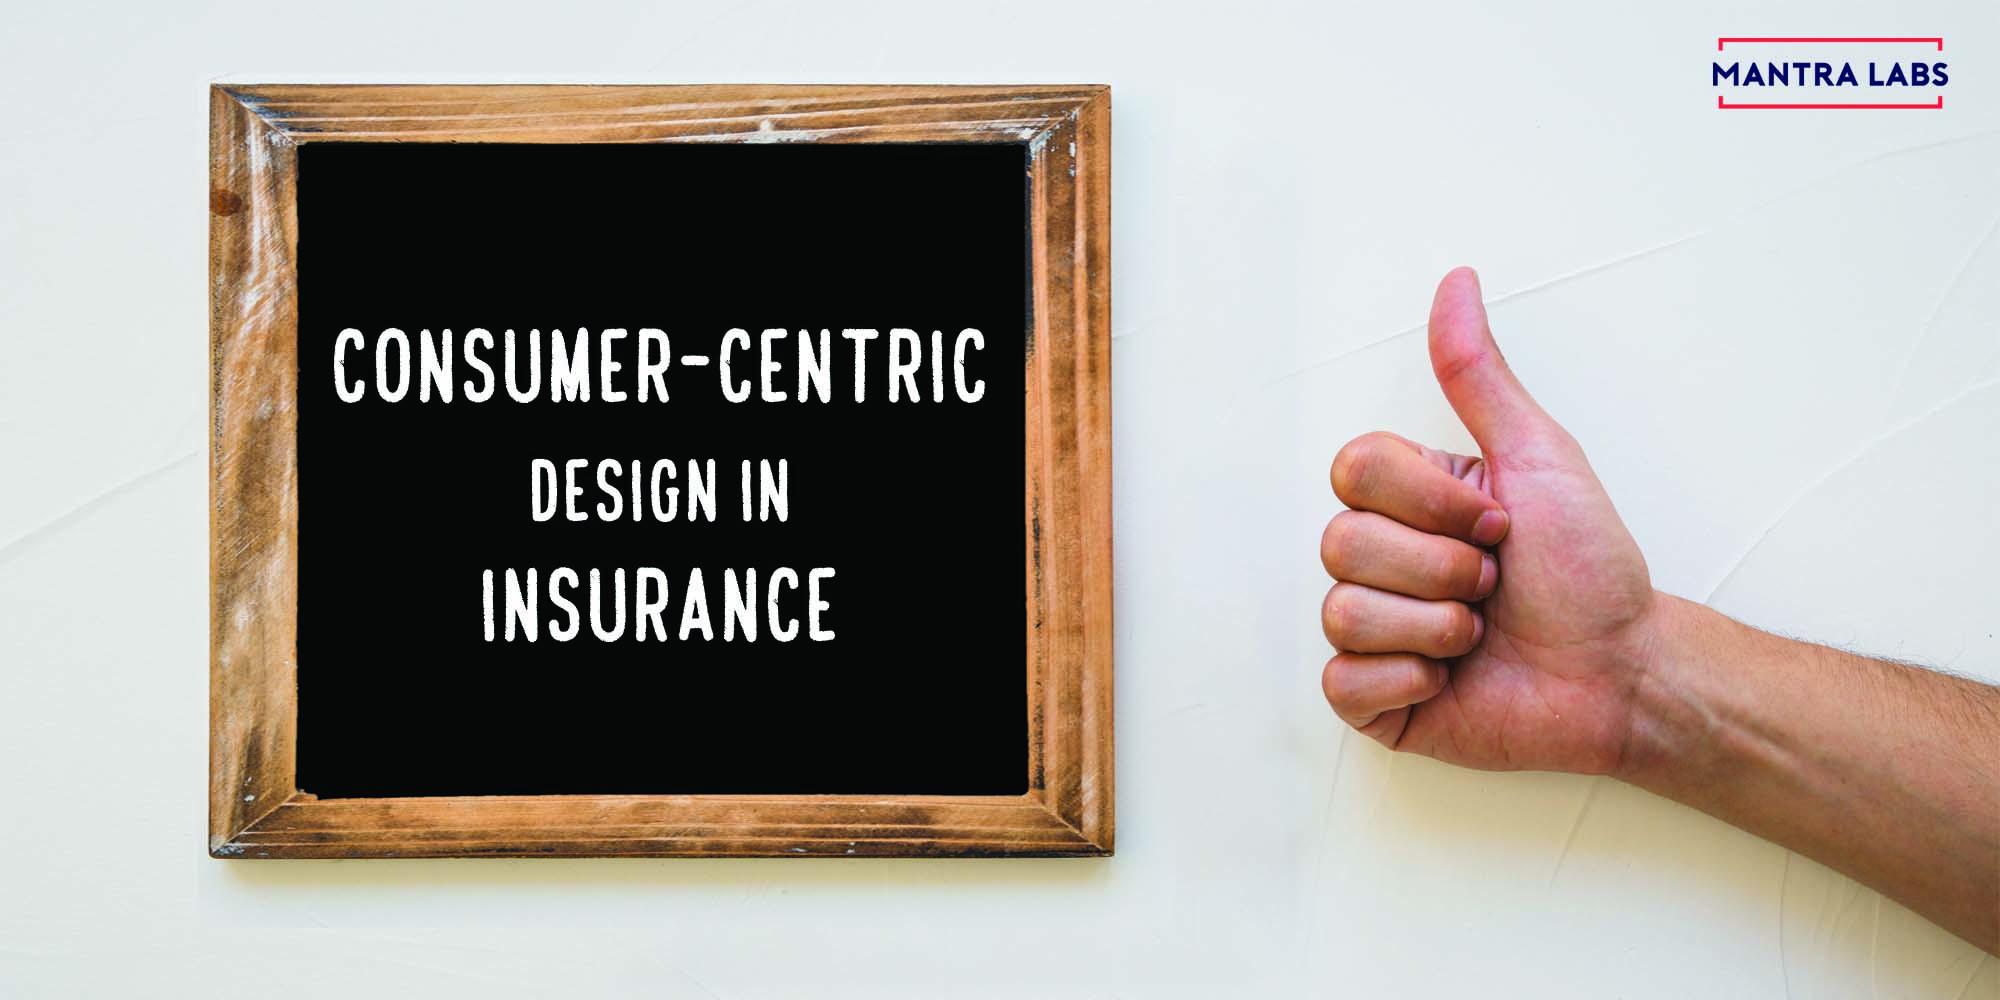 Consumer centric design in insurance